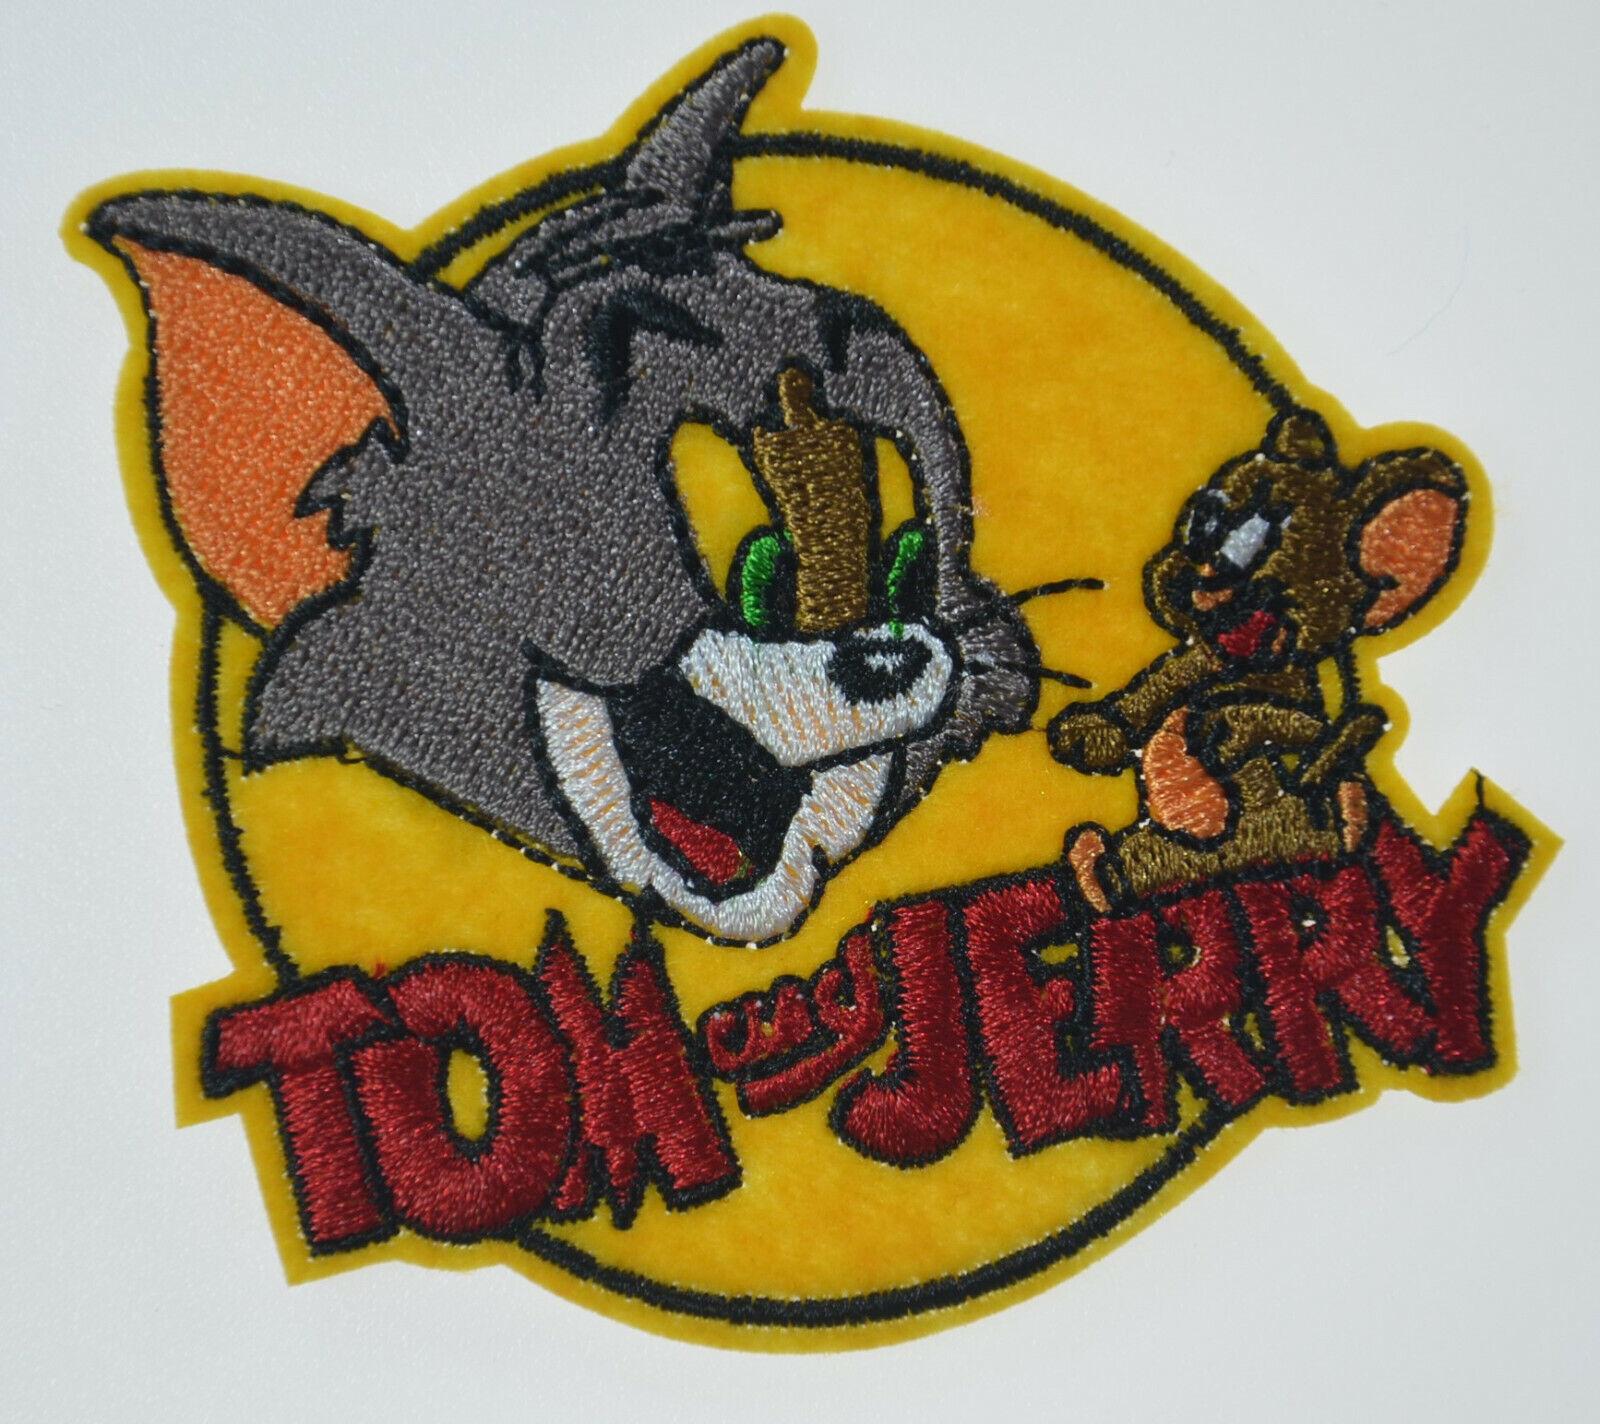 Tom and Jerry Needle Minder